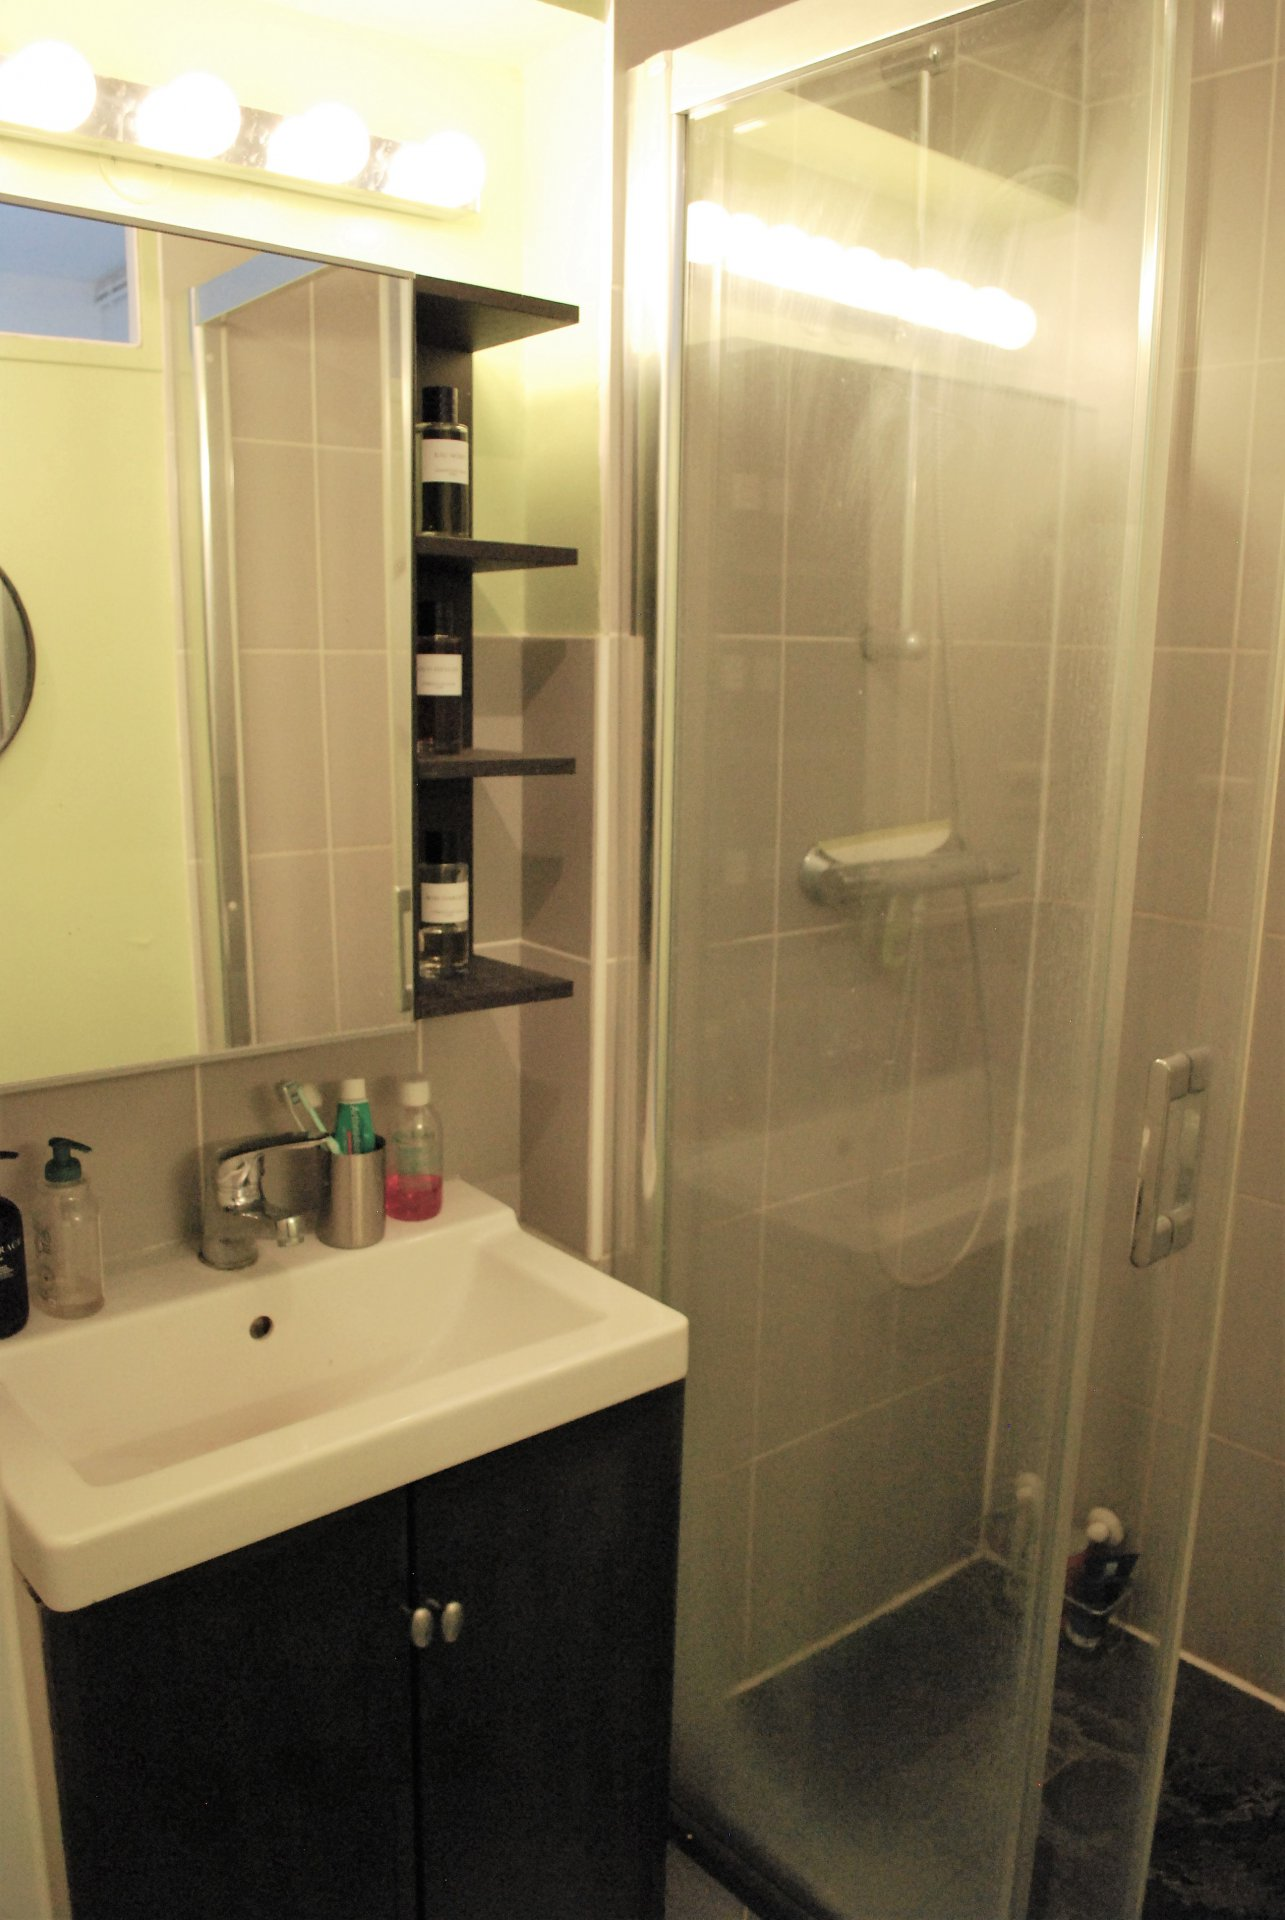 Vente Appartement - Paris 3ème Sainte-Avoye